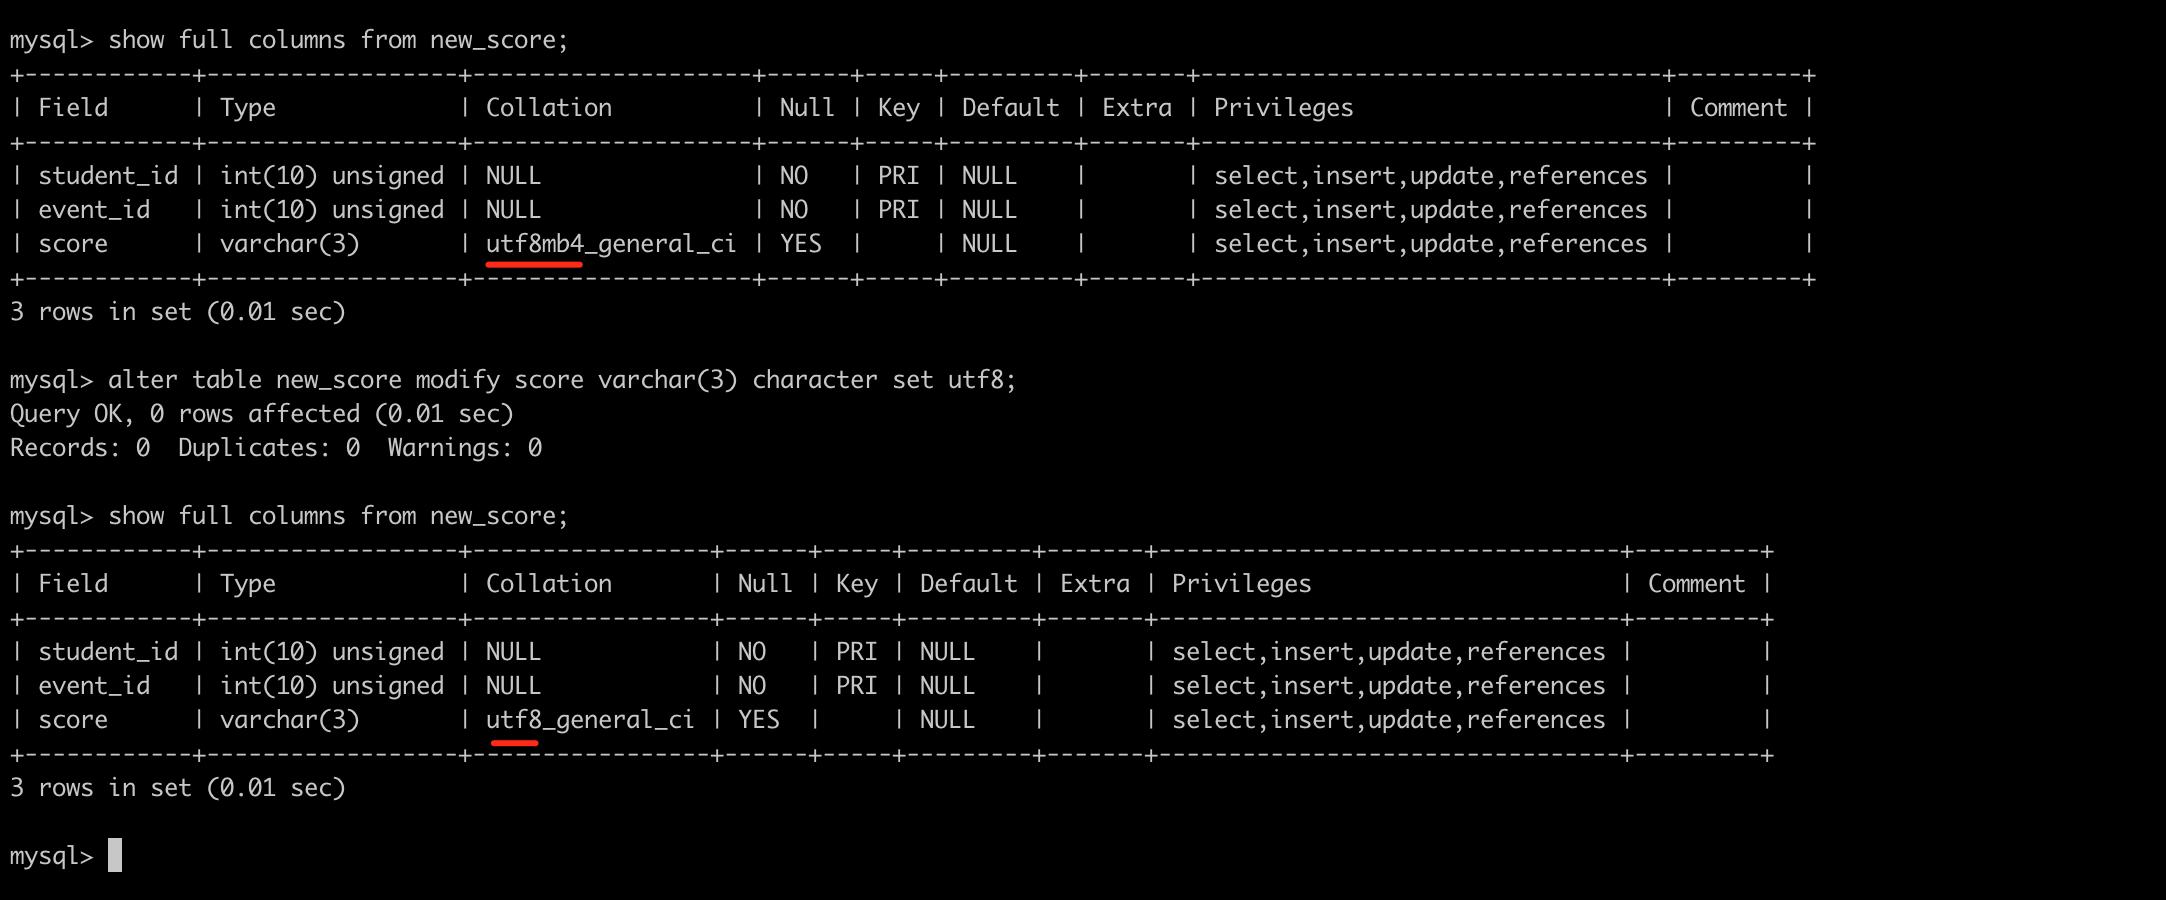 Mysql database alter modify table - Programmer Sought